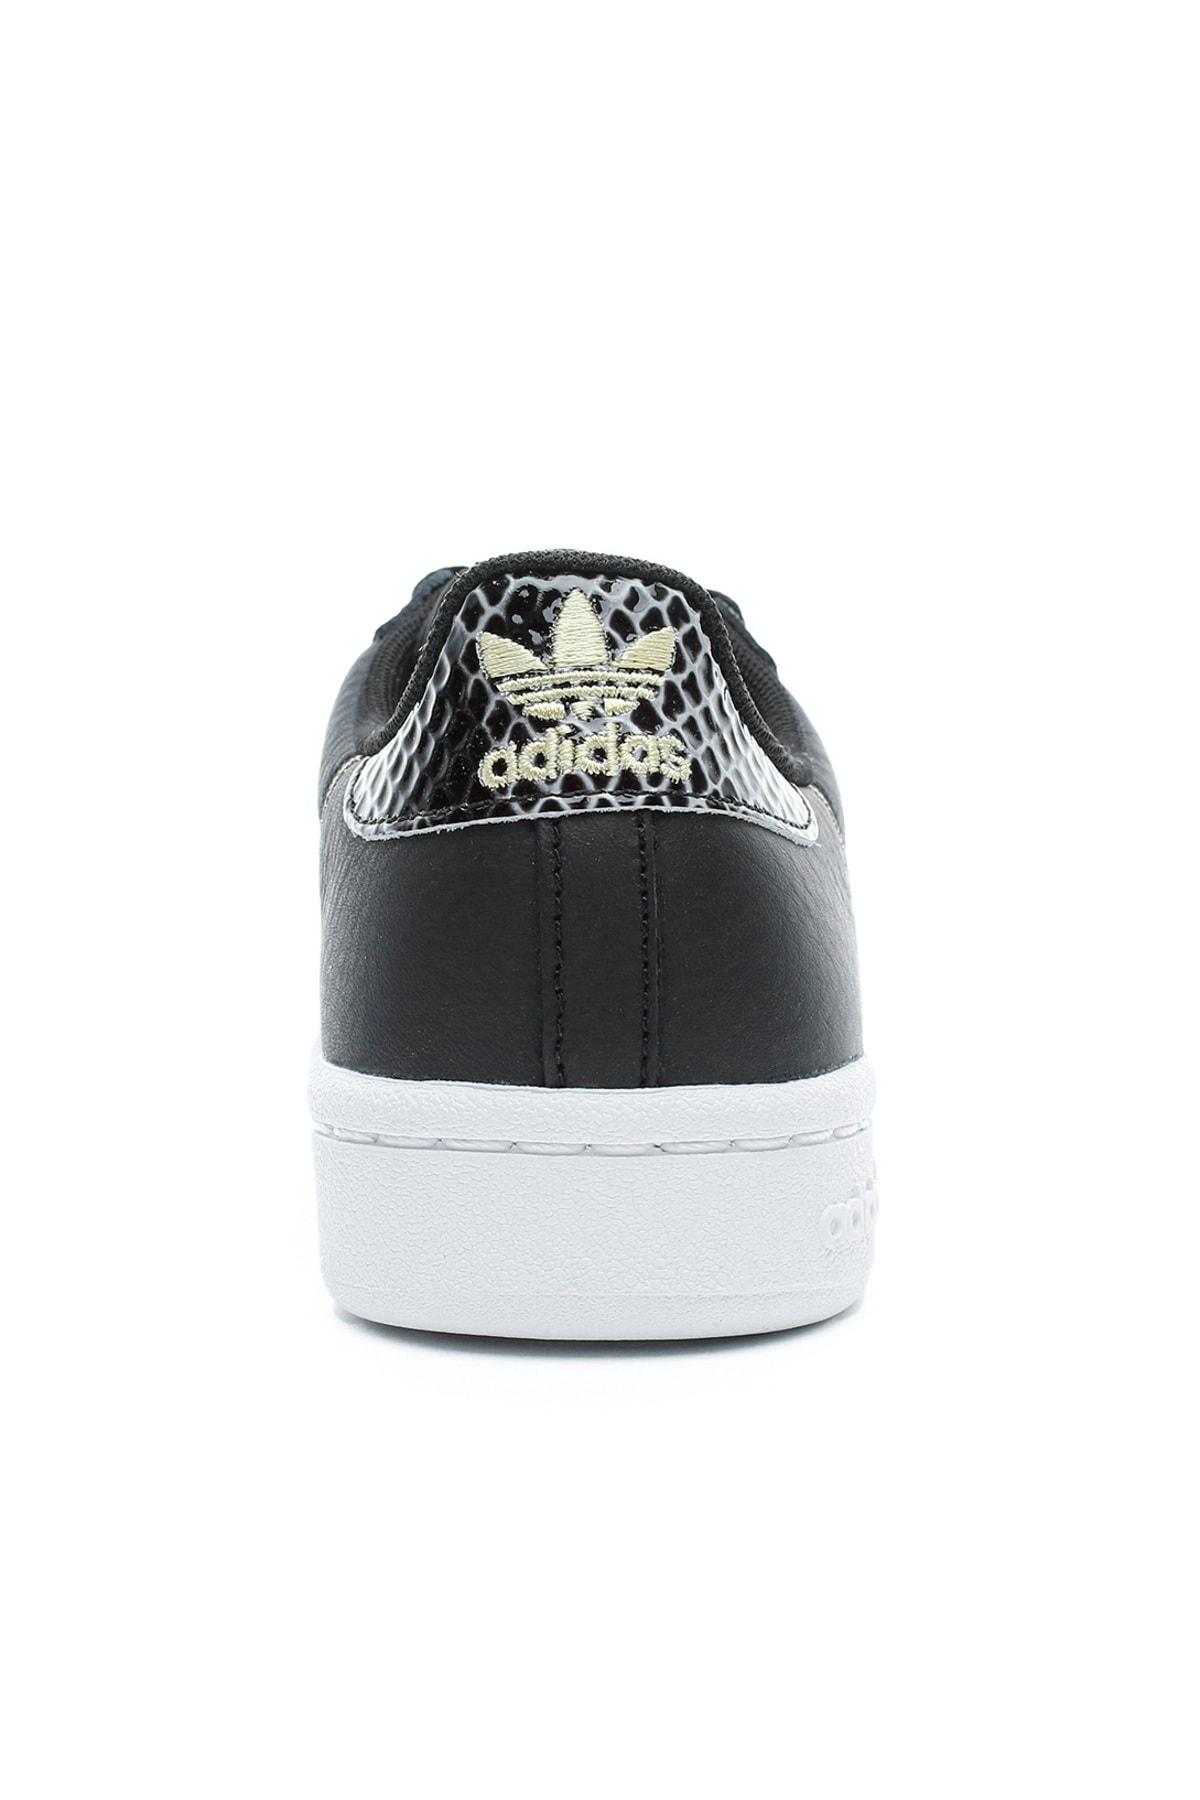 adidas Continental 80 Kadın Siyah Spor Ayakkabı 2